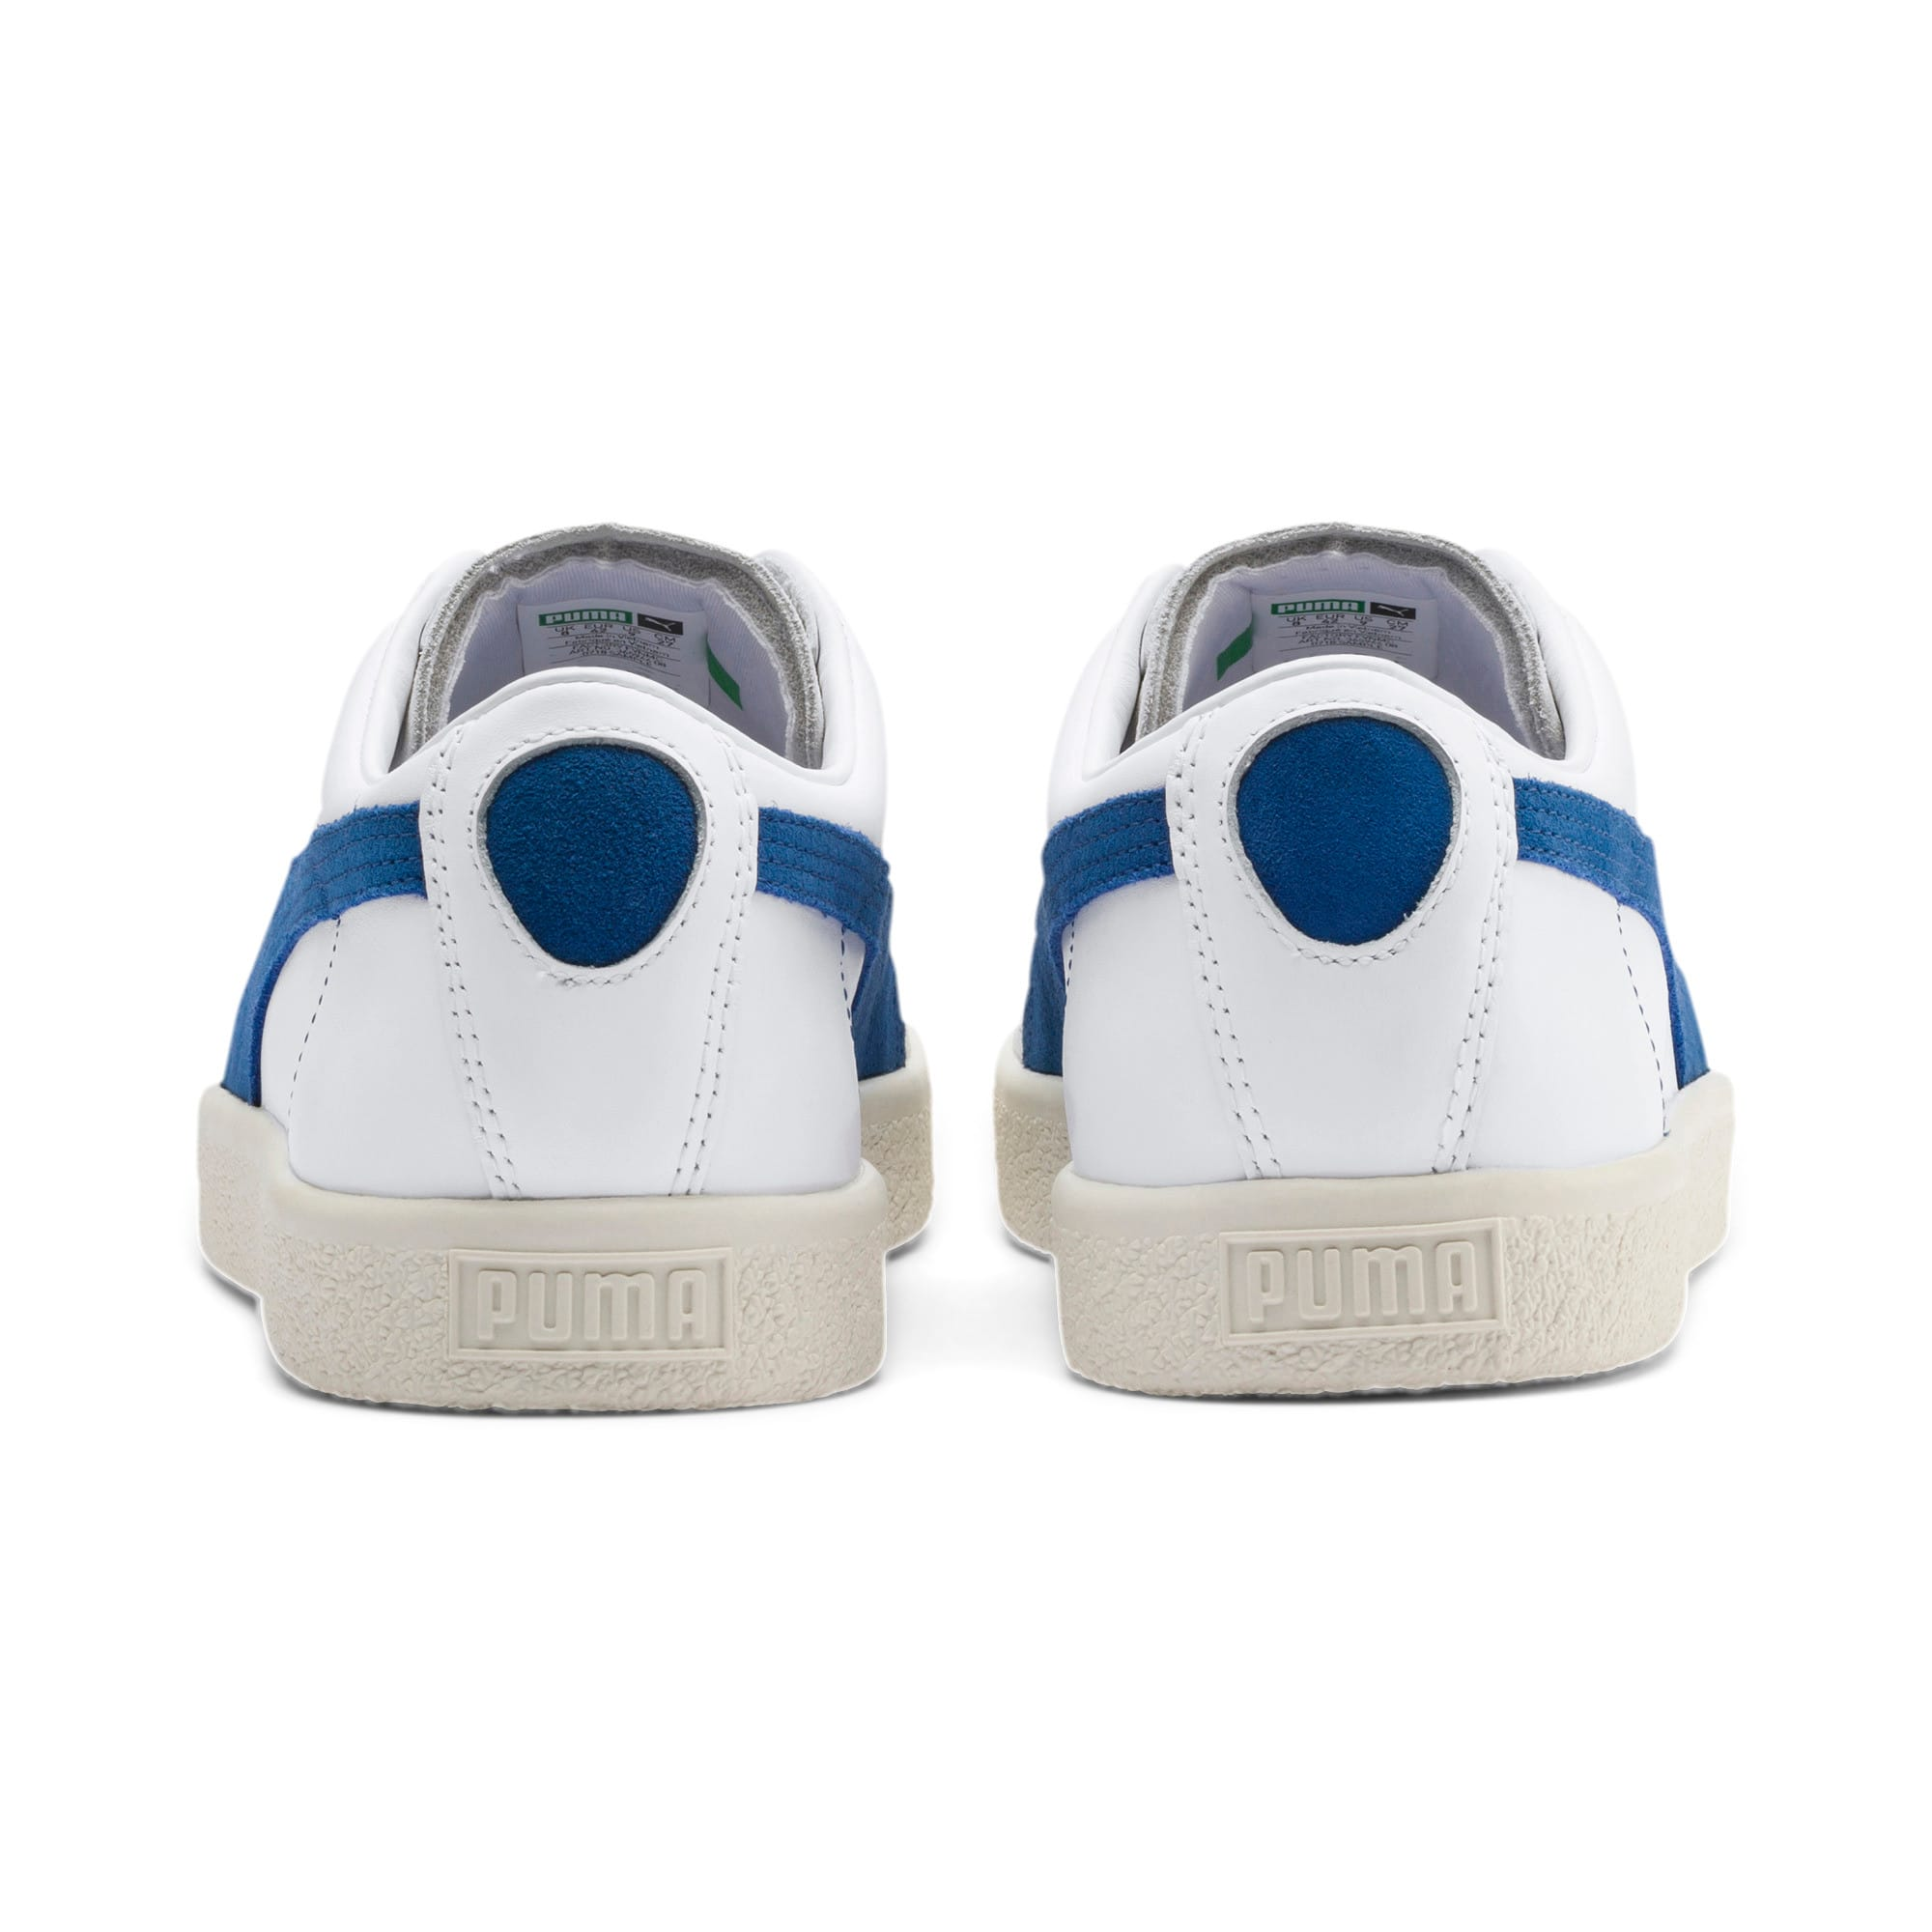 Thumbnail 4 of Basket 90680 Sneakers, Puma White-Galaxy Blue-Whisp, medium